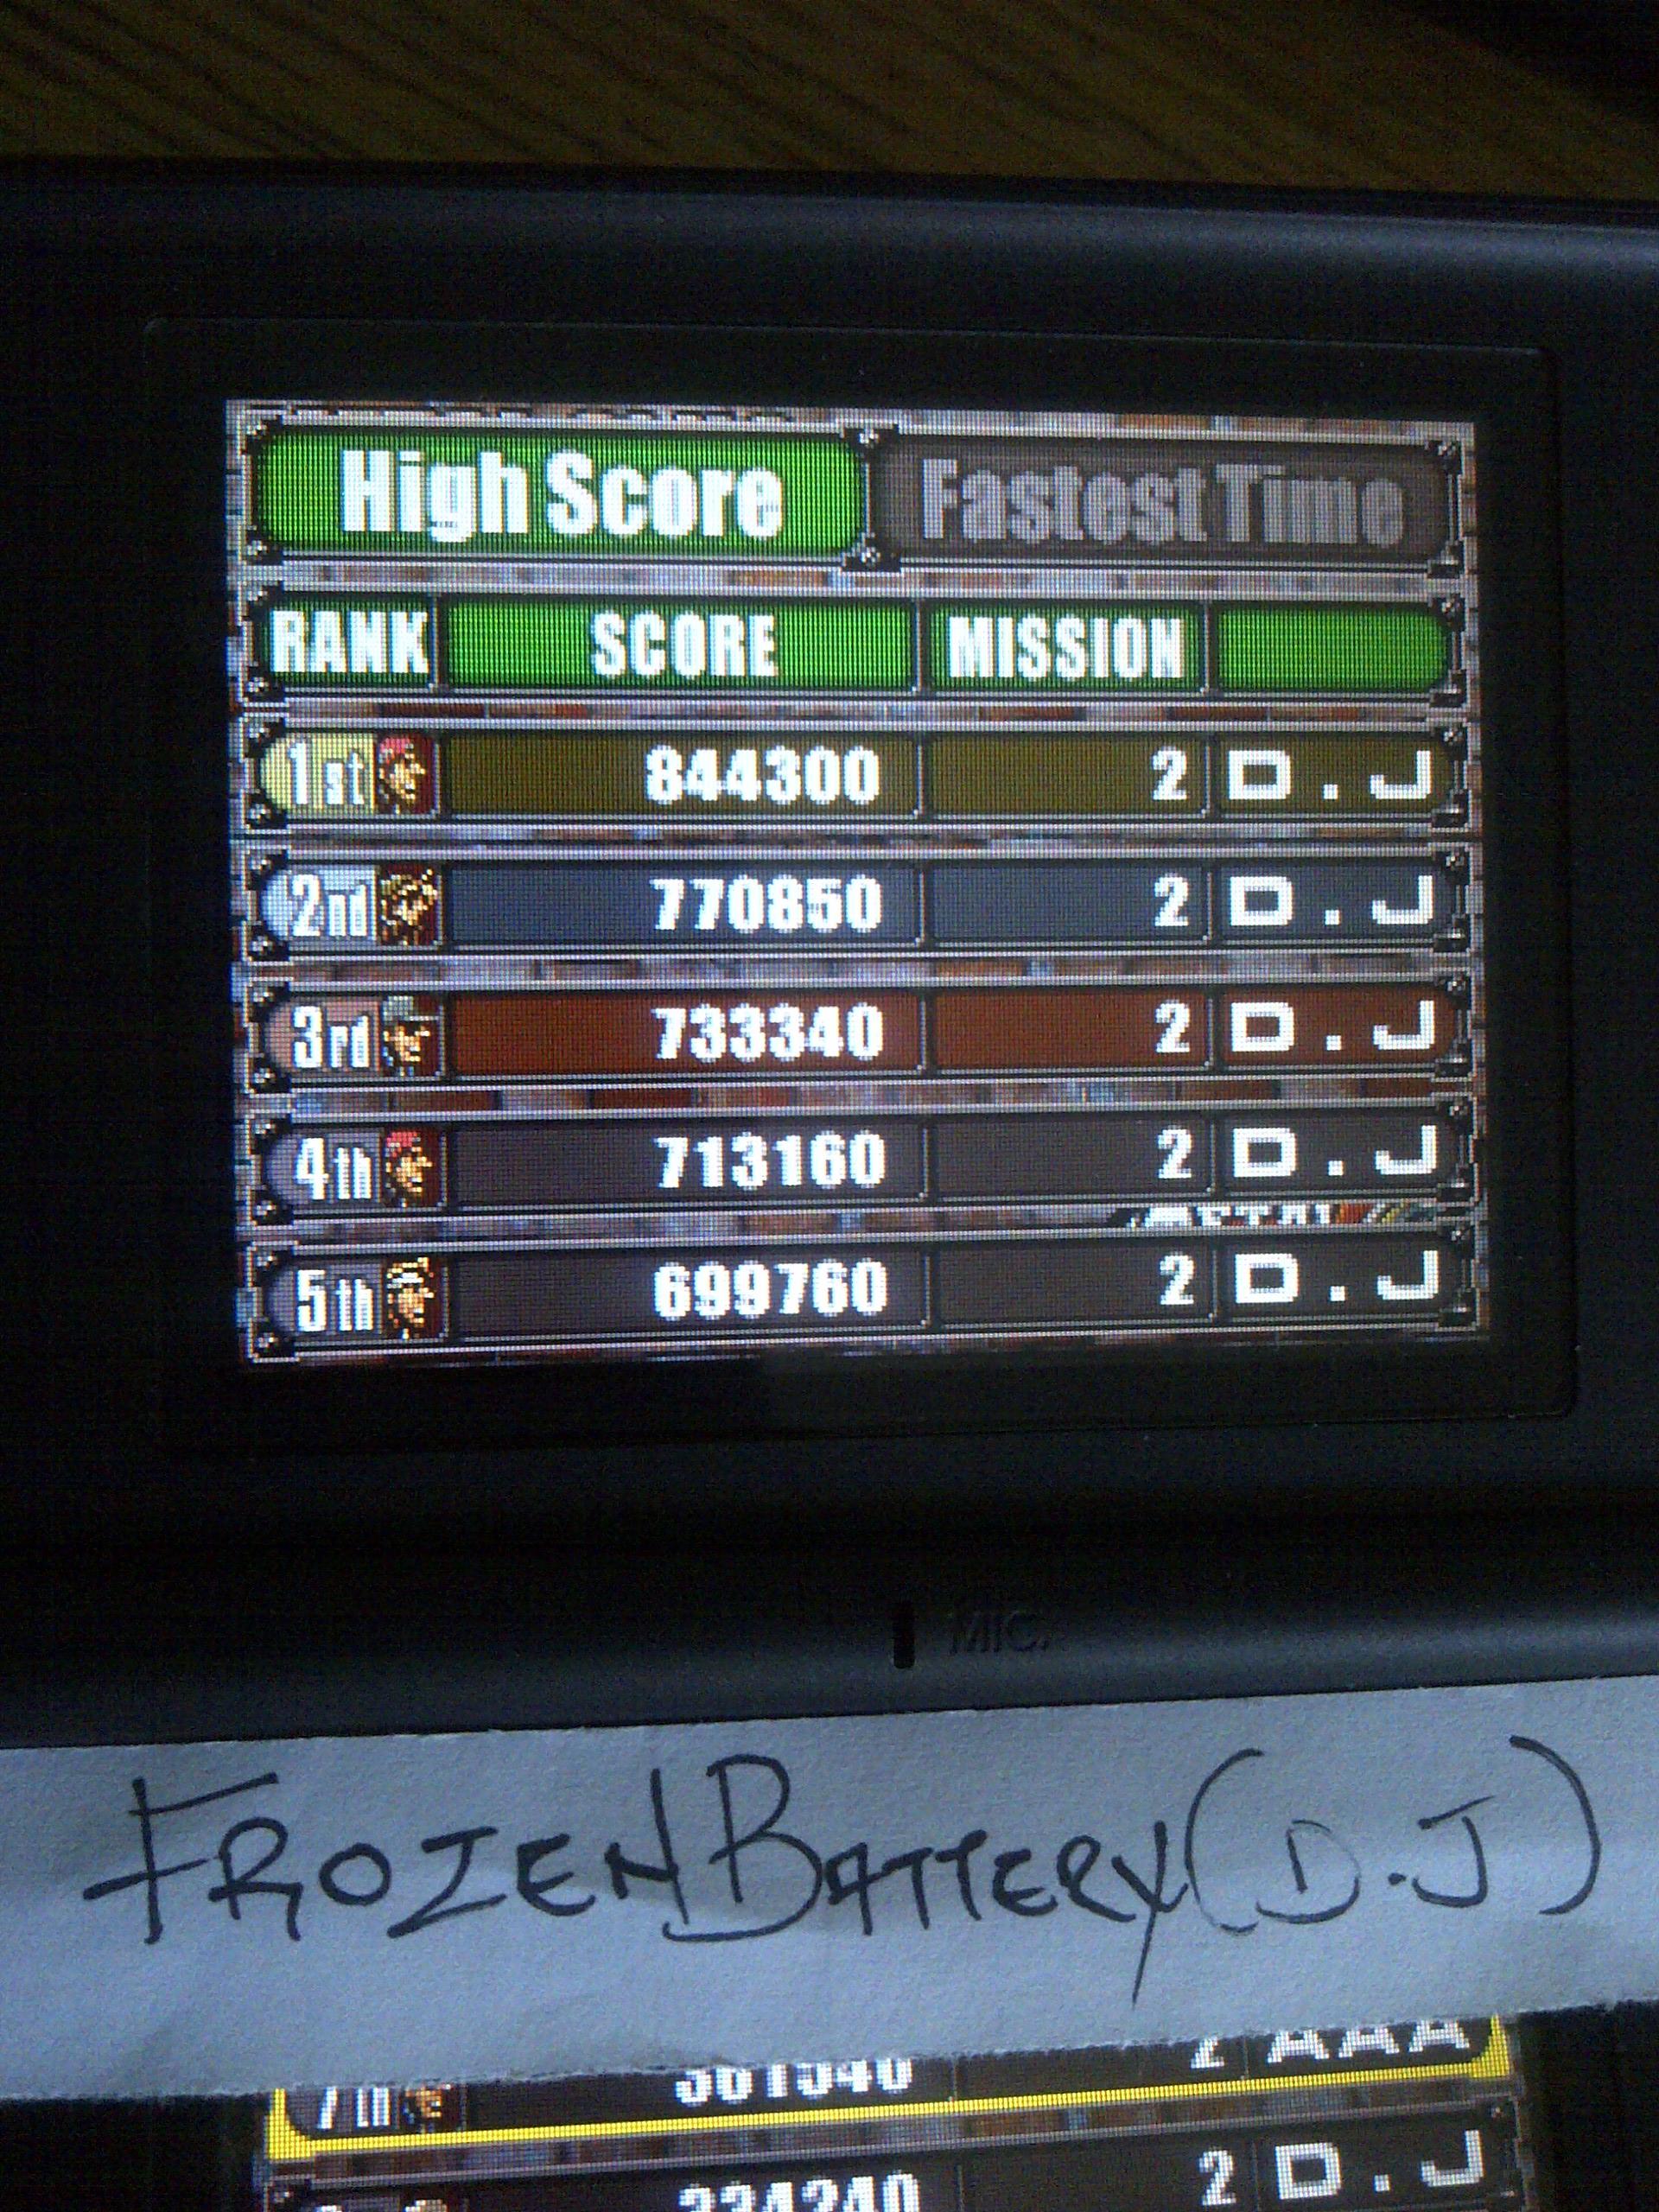 Metal Slug 7 844,300 points